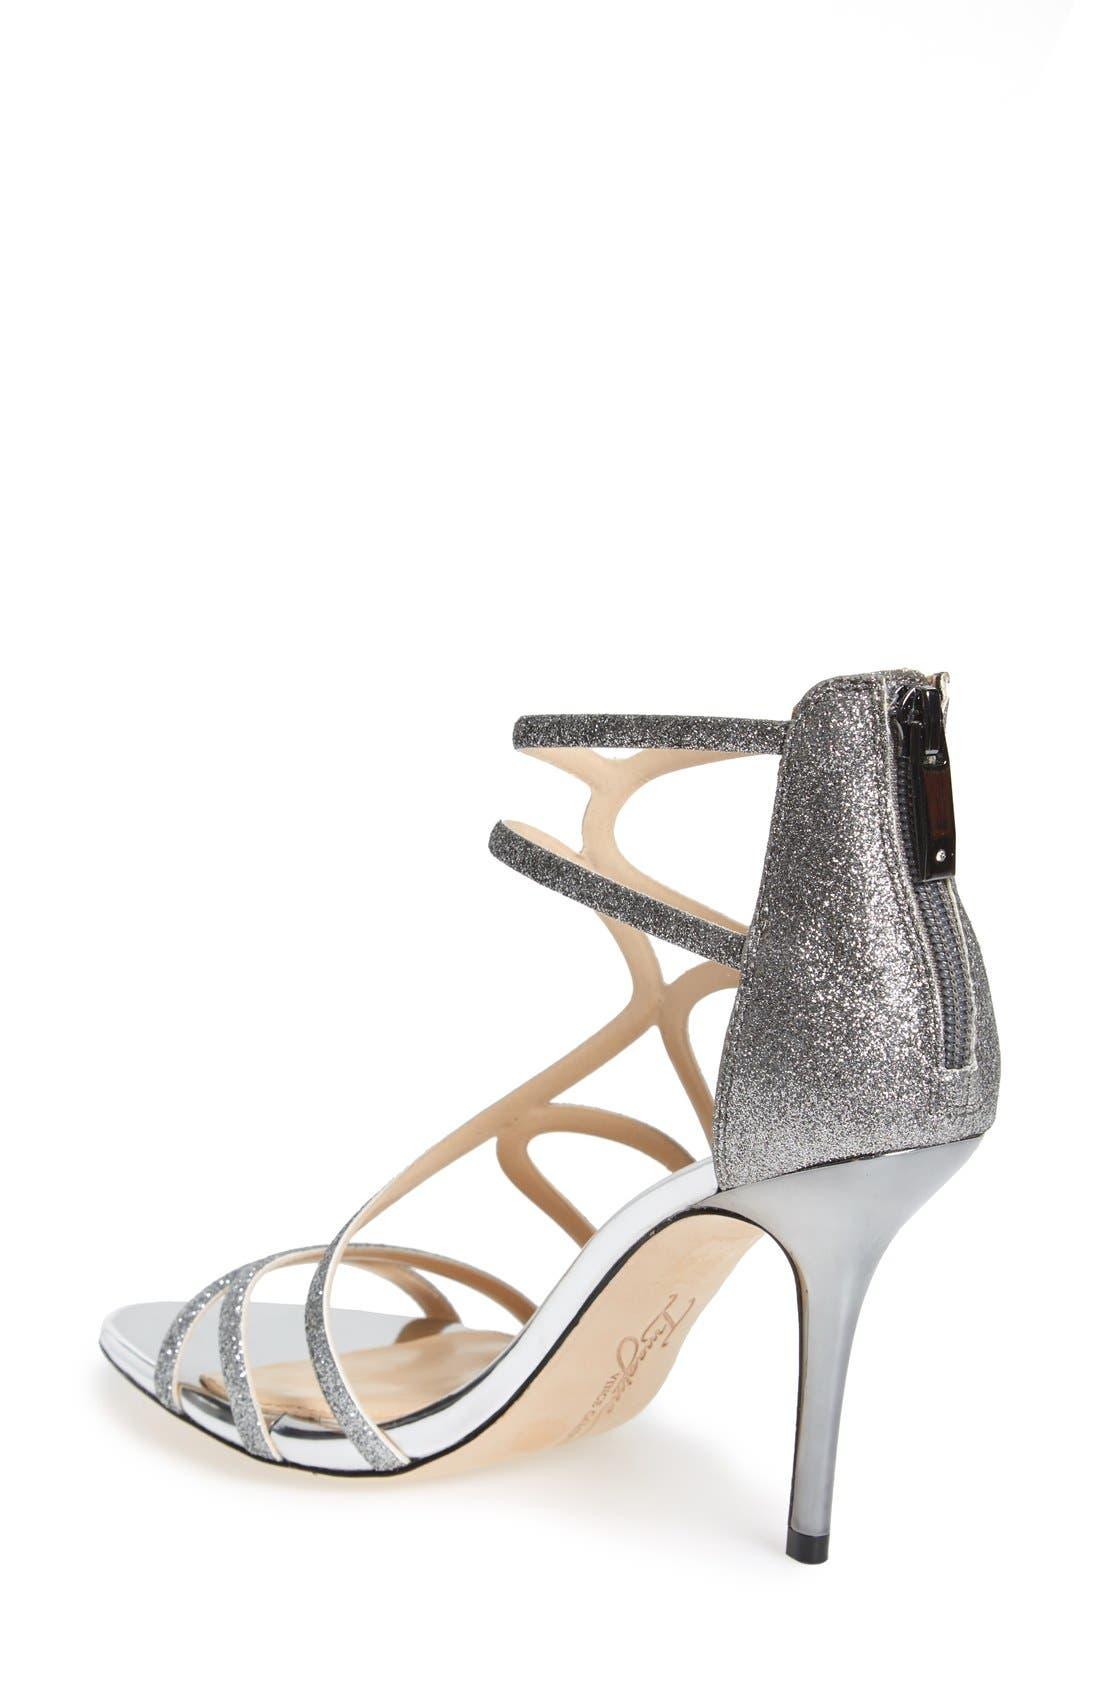 'Ranee' Dress Sandal,                             Alternate thumbnail 12, color,